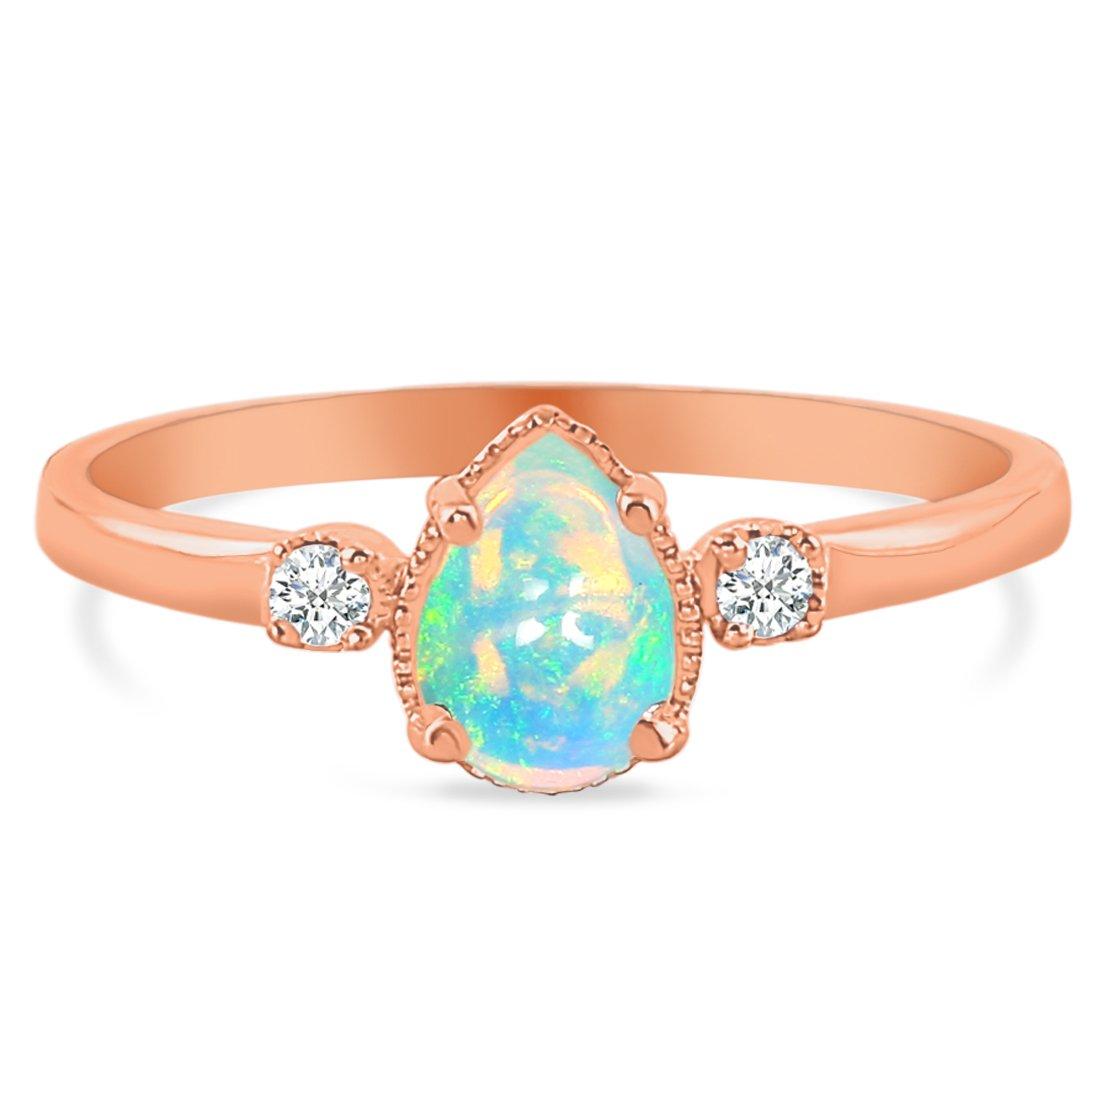 14k Rose Gold Vermeil Opal Ring-Exist